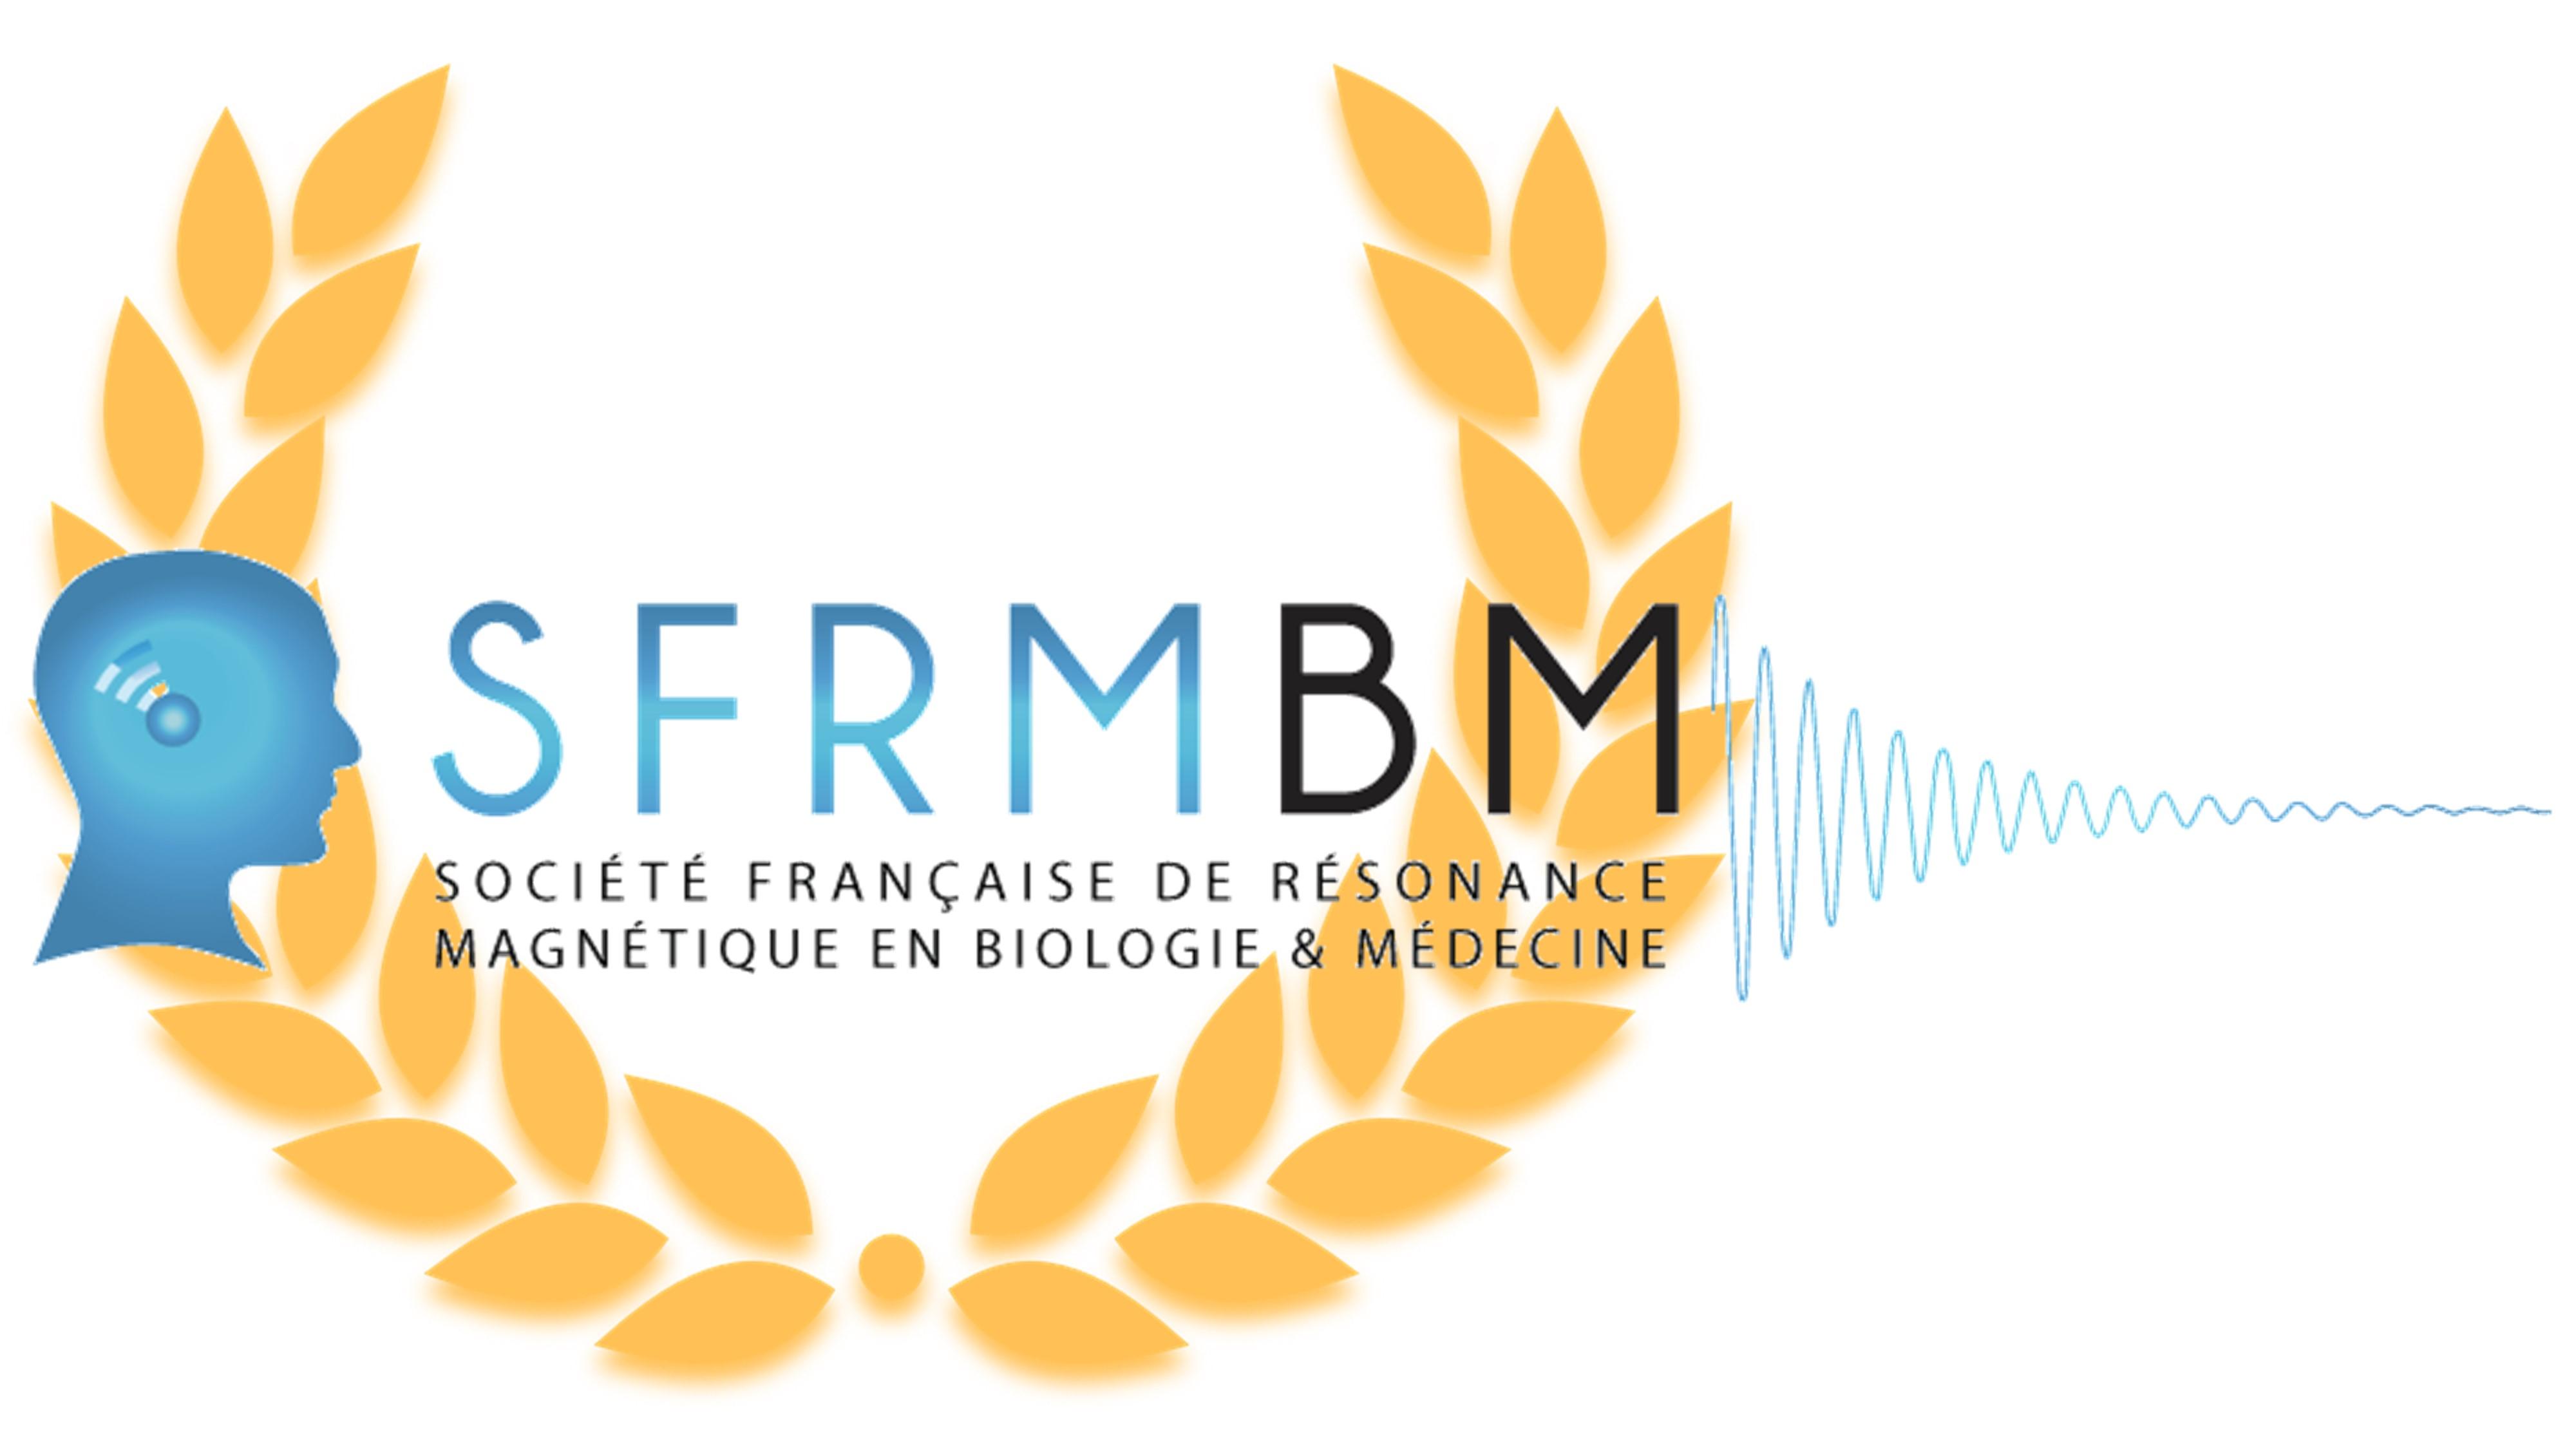 Prix de thèse de doctorat de la SFRMBM 2019